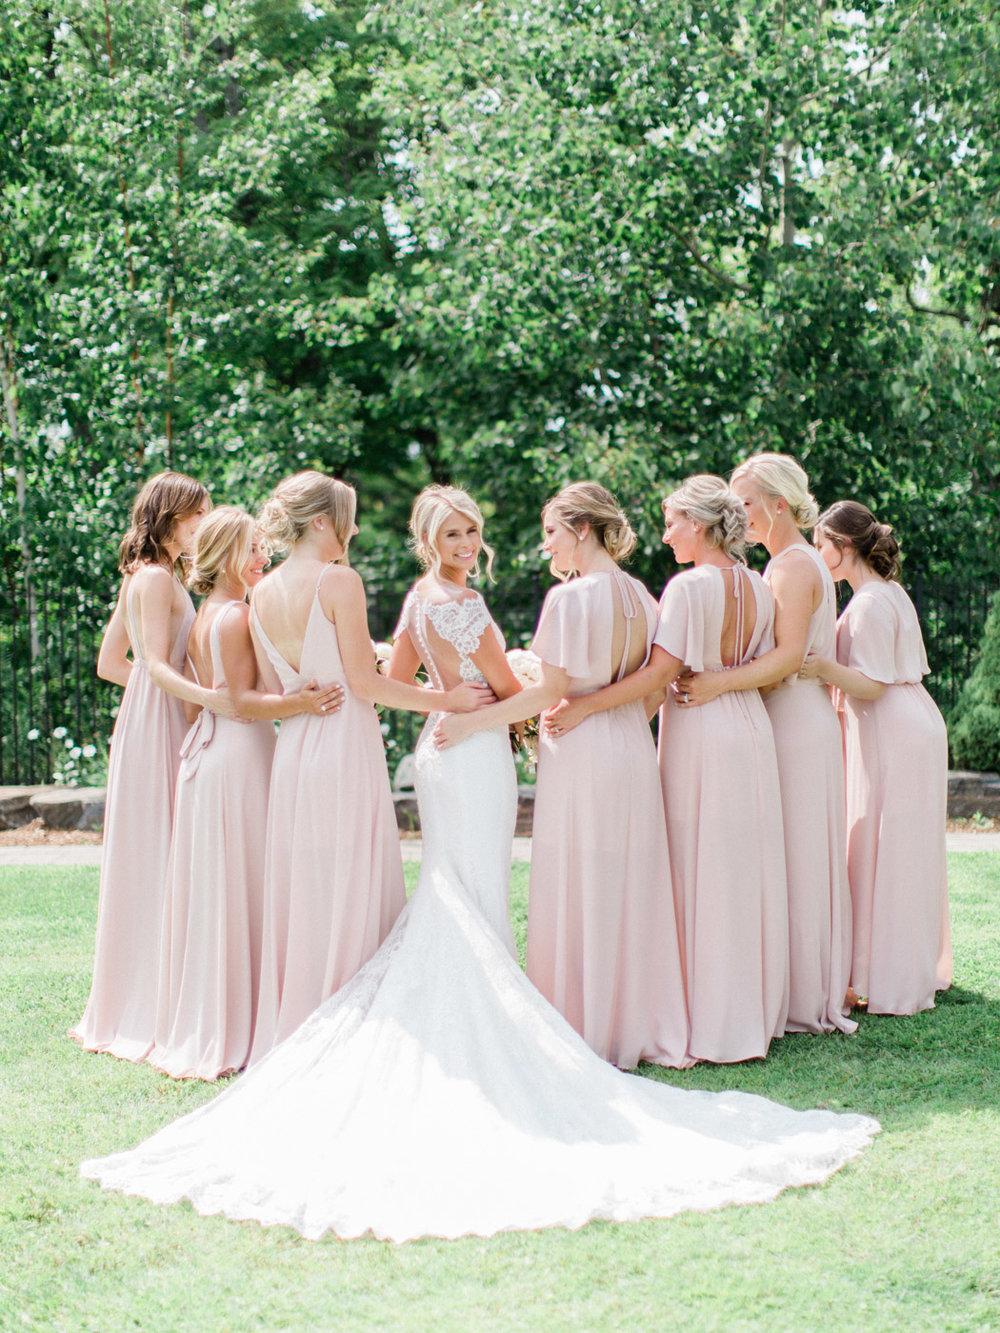 Toronto-Muskoka-wedding-photographer-summery-fun-documentary-the-marriott-rosseau47.jpg